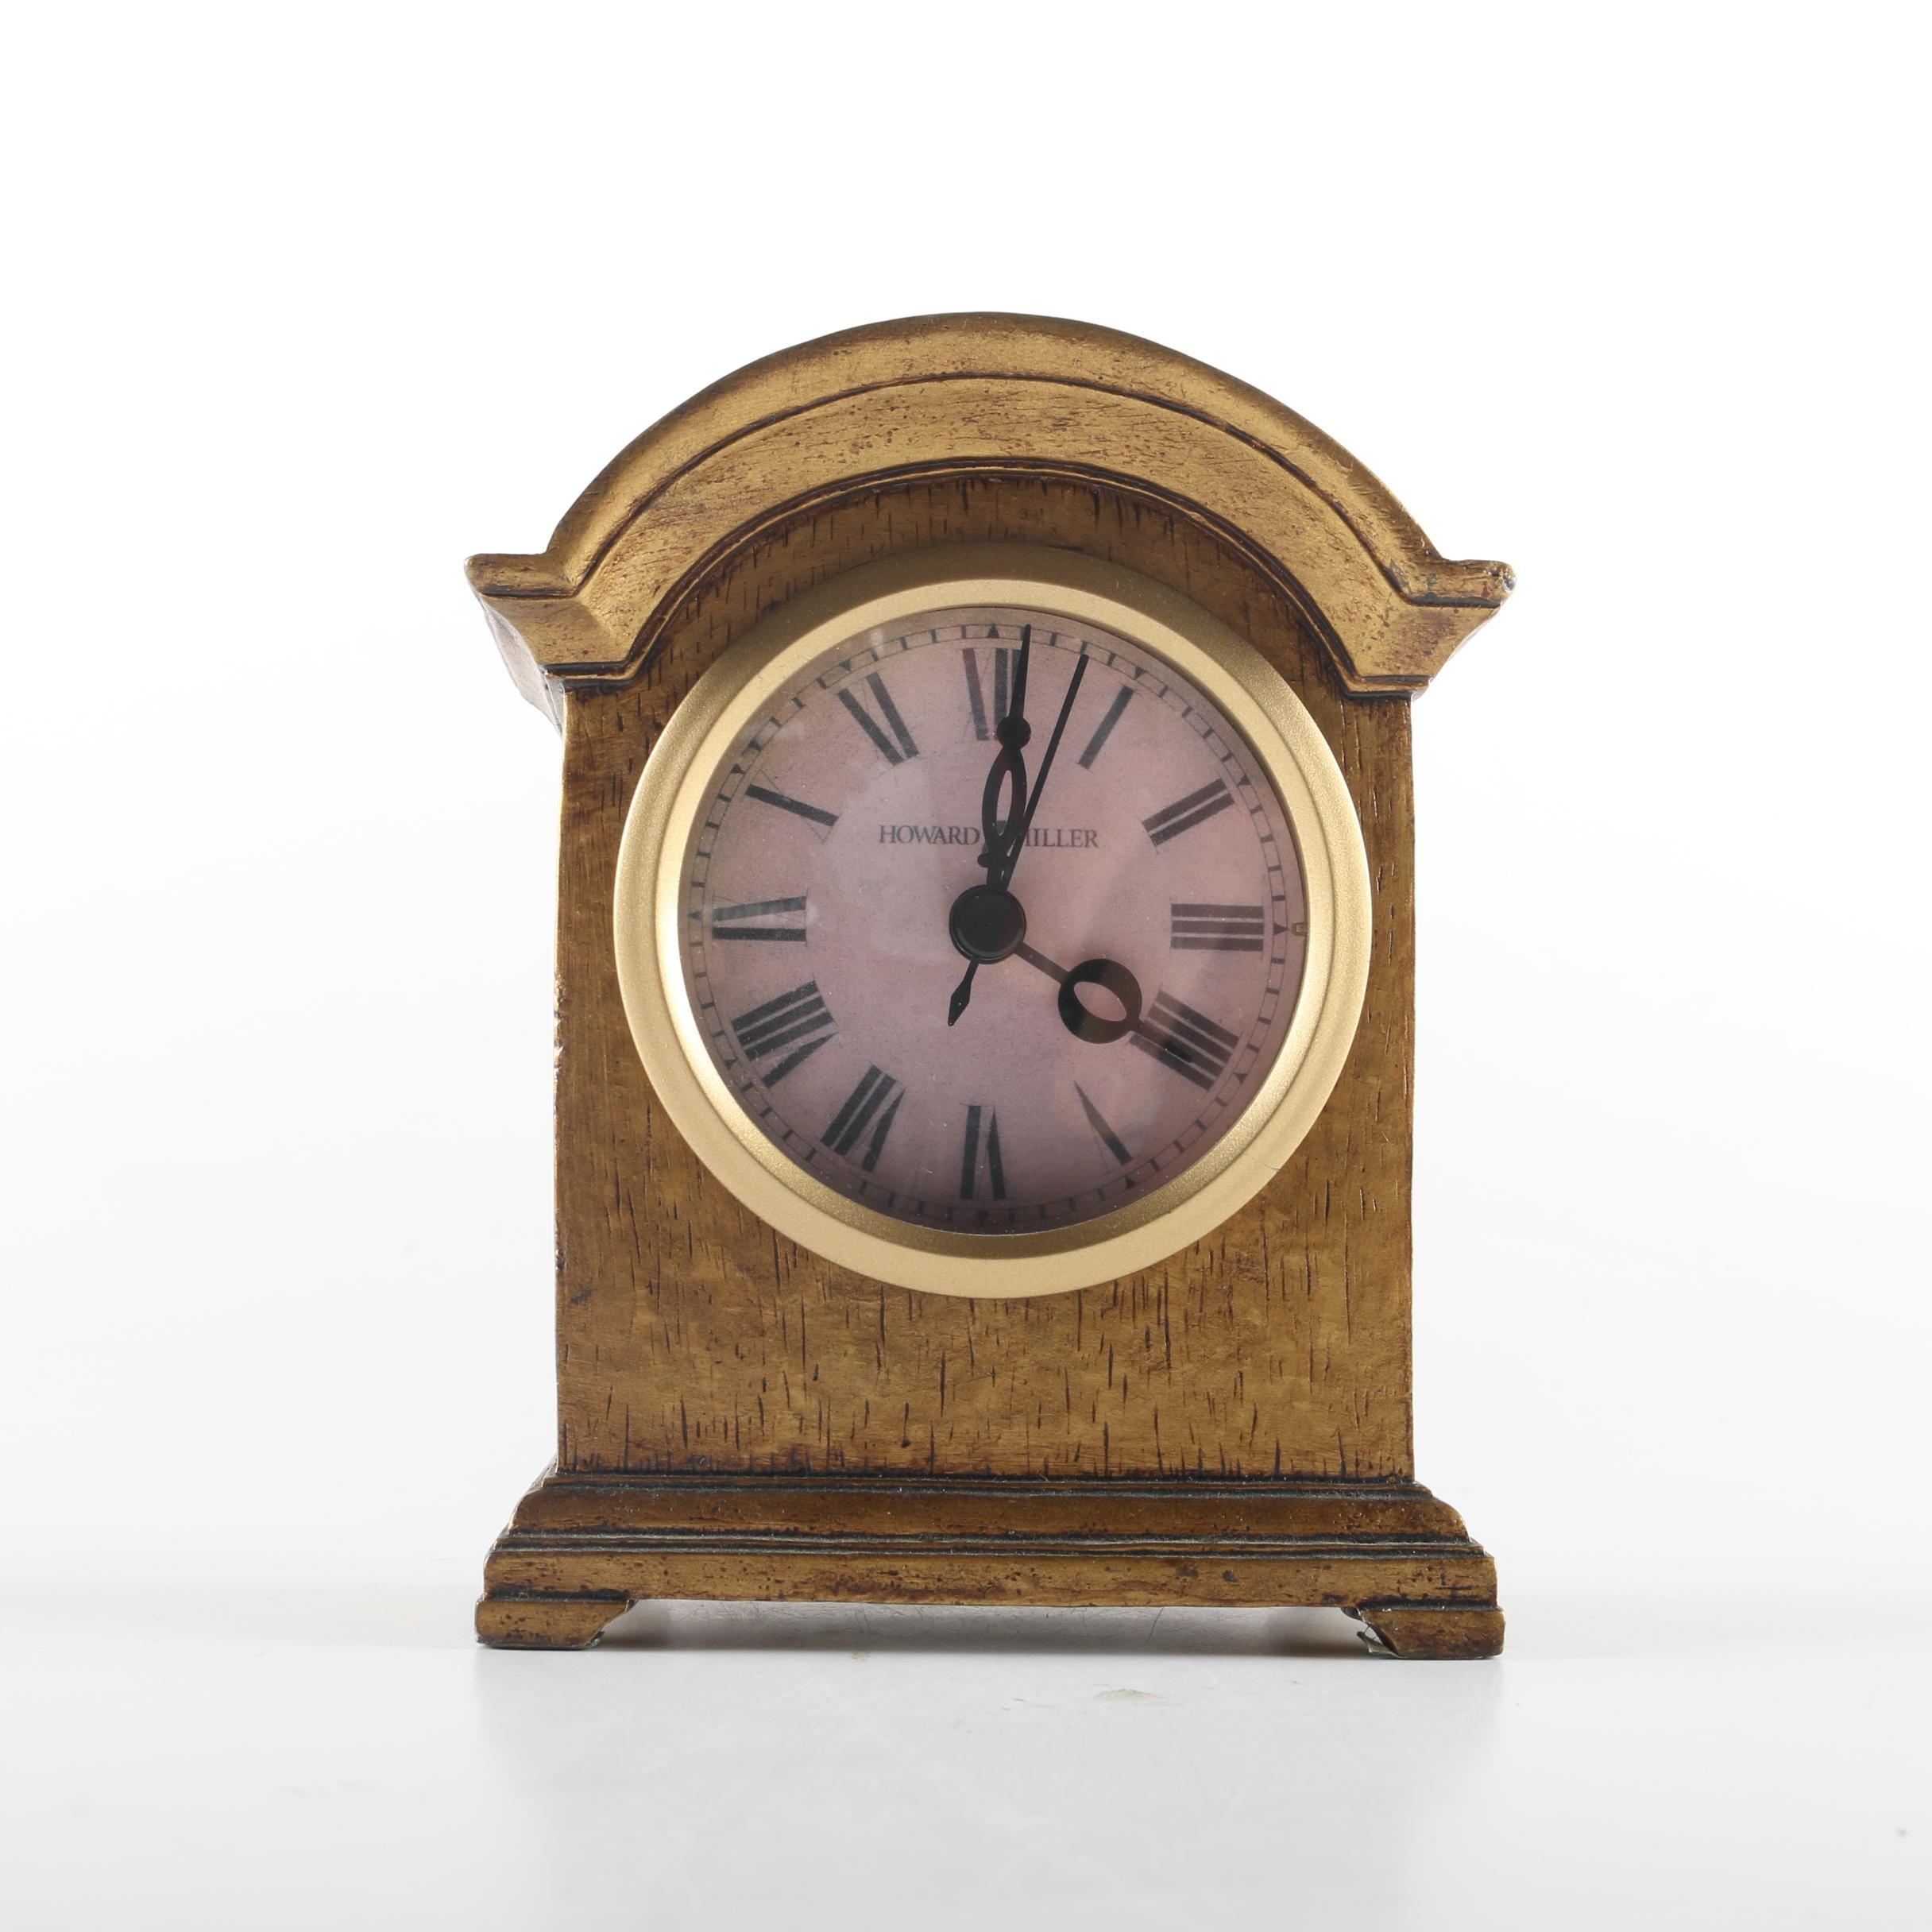 Howard Miller Analog Mantel Clock